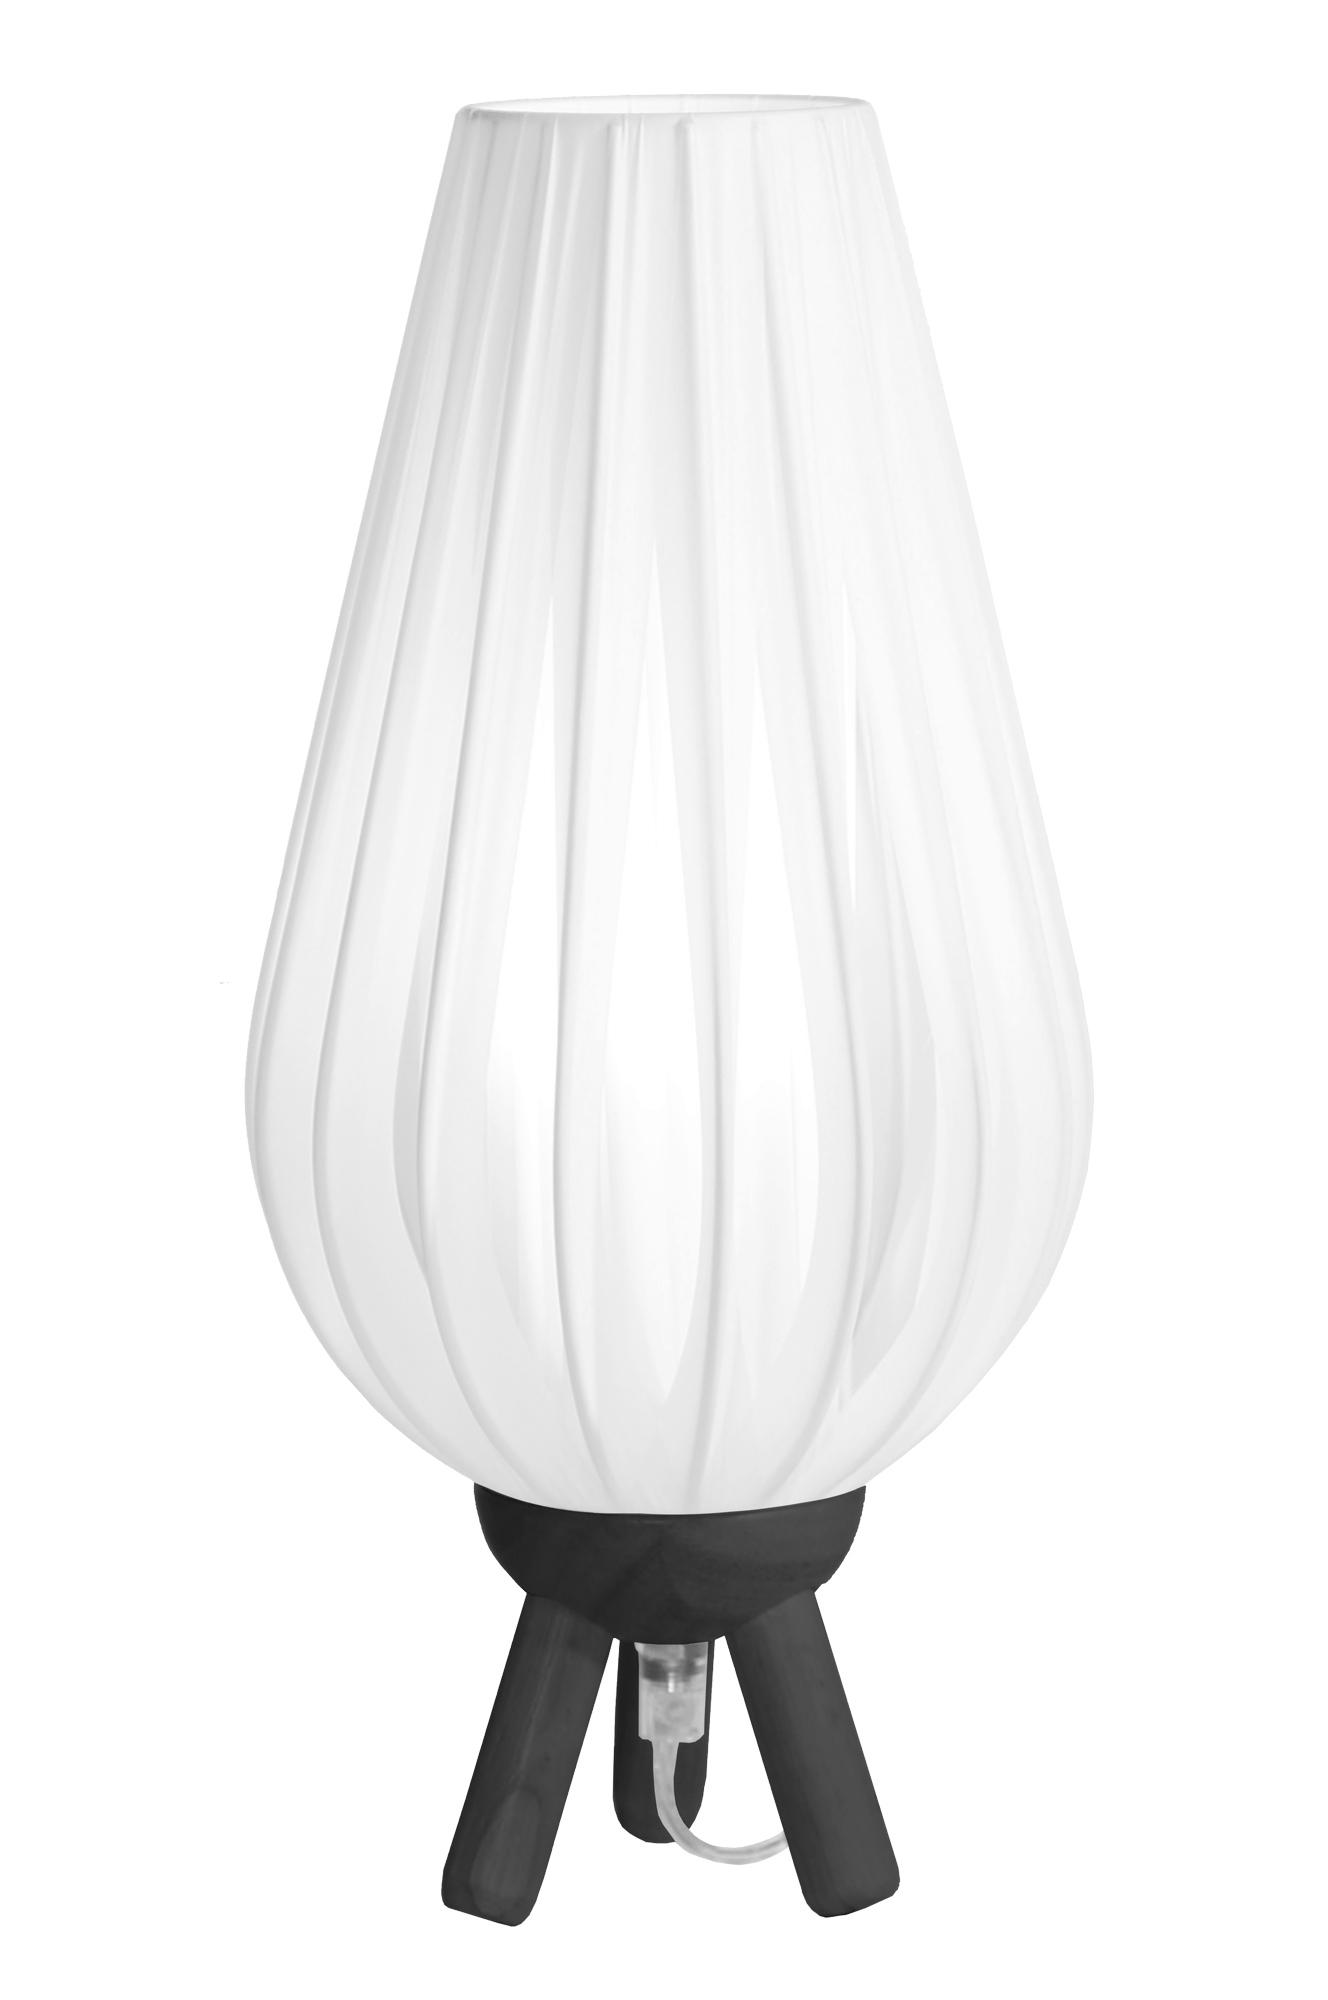 Bordlampe Ellos Bordlamper til Boligen i Sort